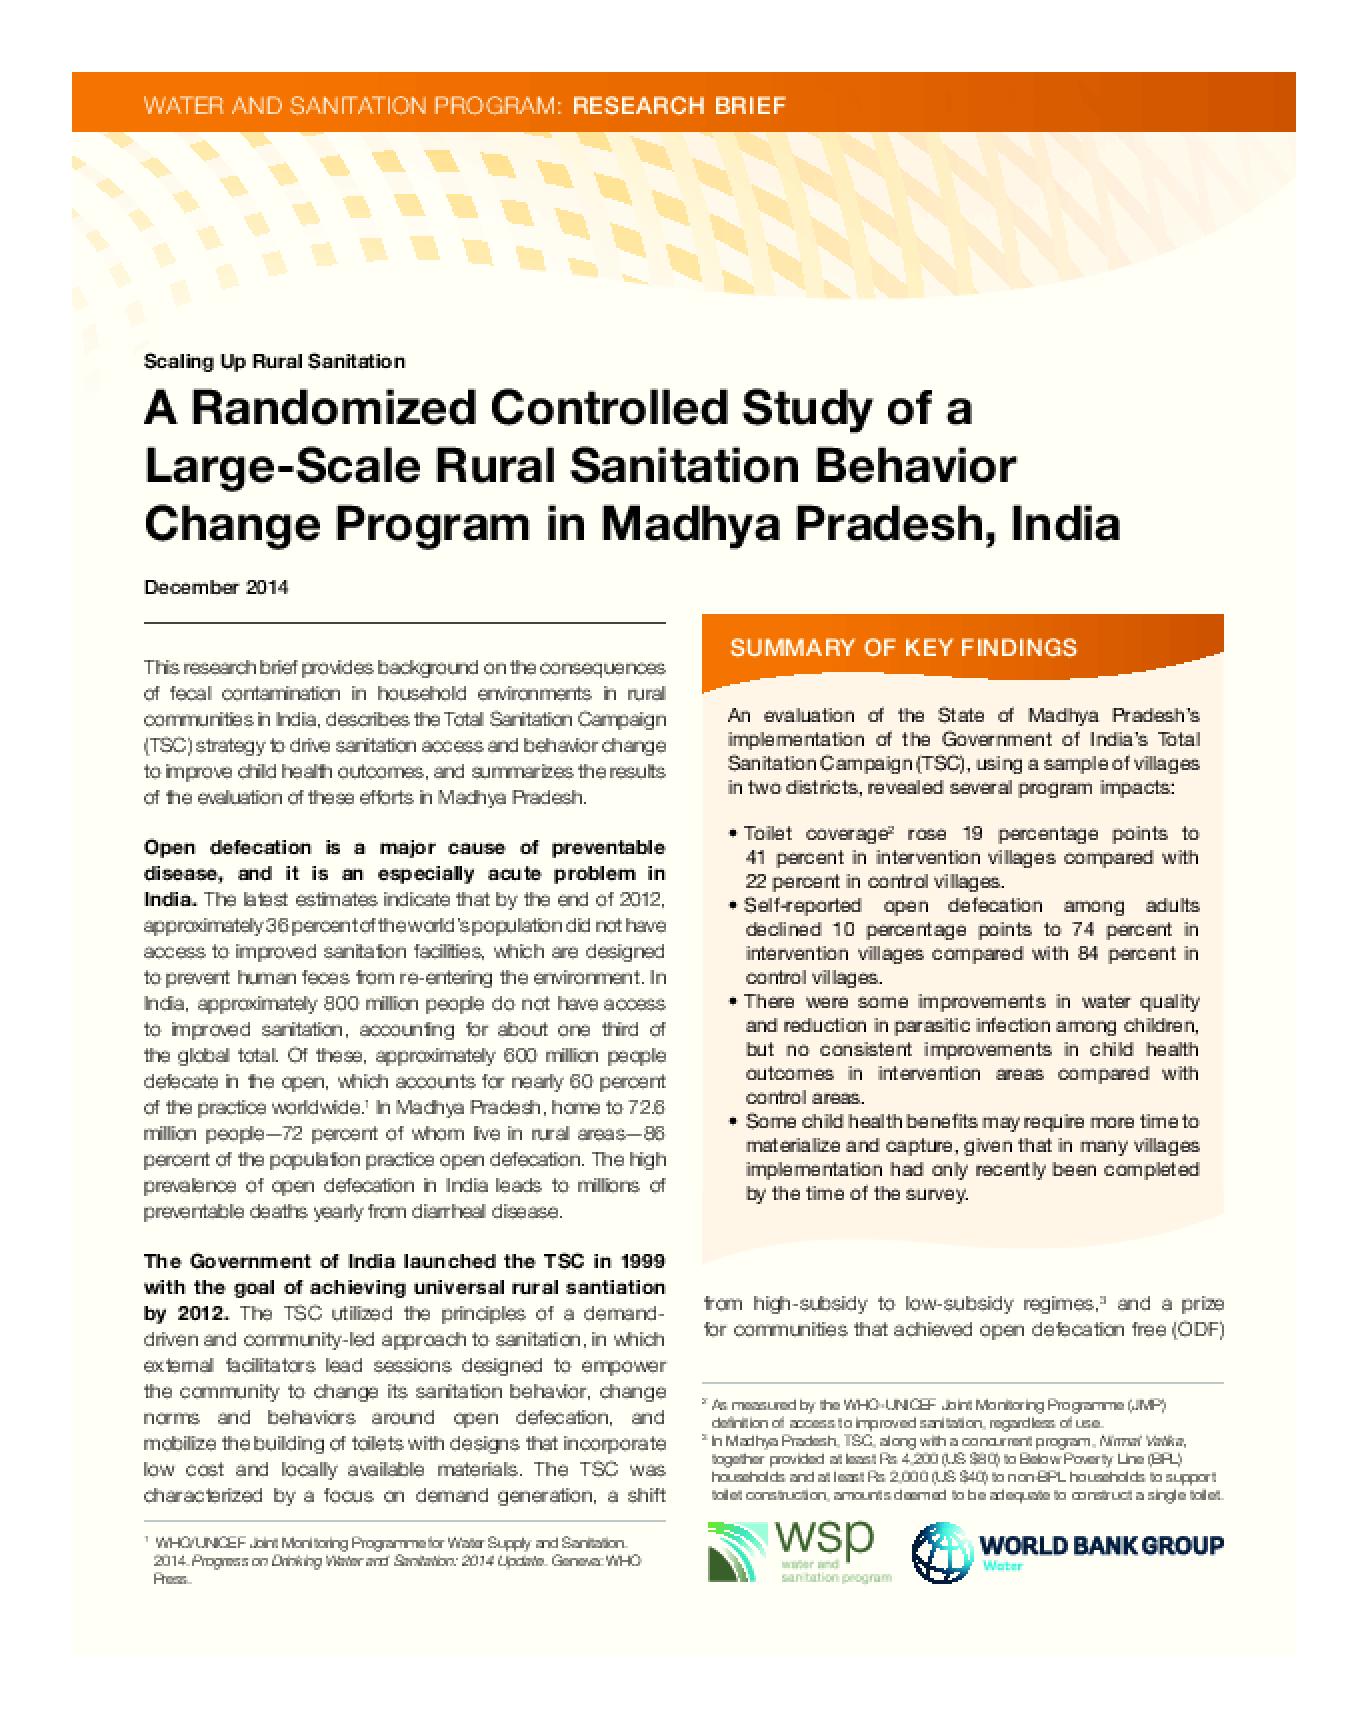 A Randomized Controlled Study of a Large-Scale Rural Sanitation Behavior Change Program in Madhya Pradesh, India